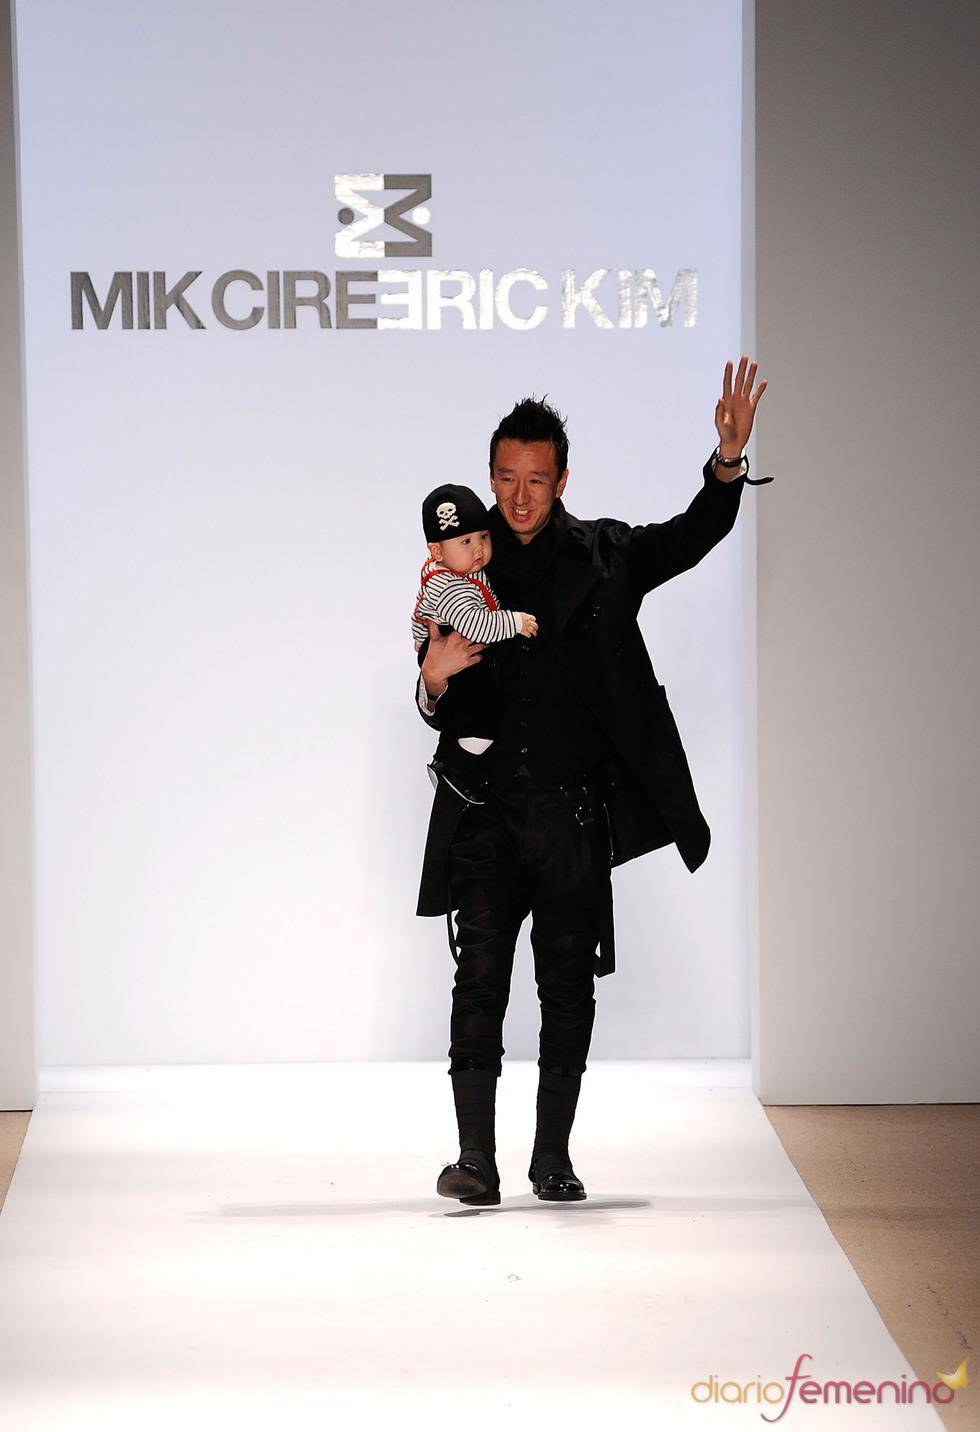 Mik Cire By Eric Kim